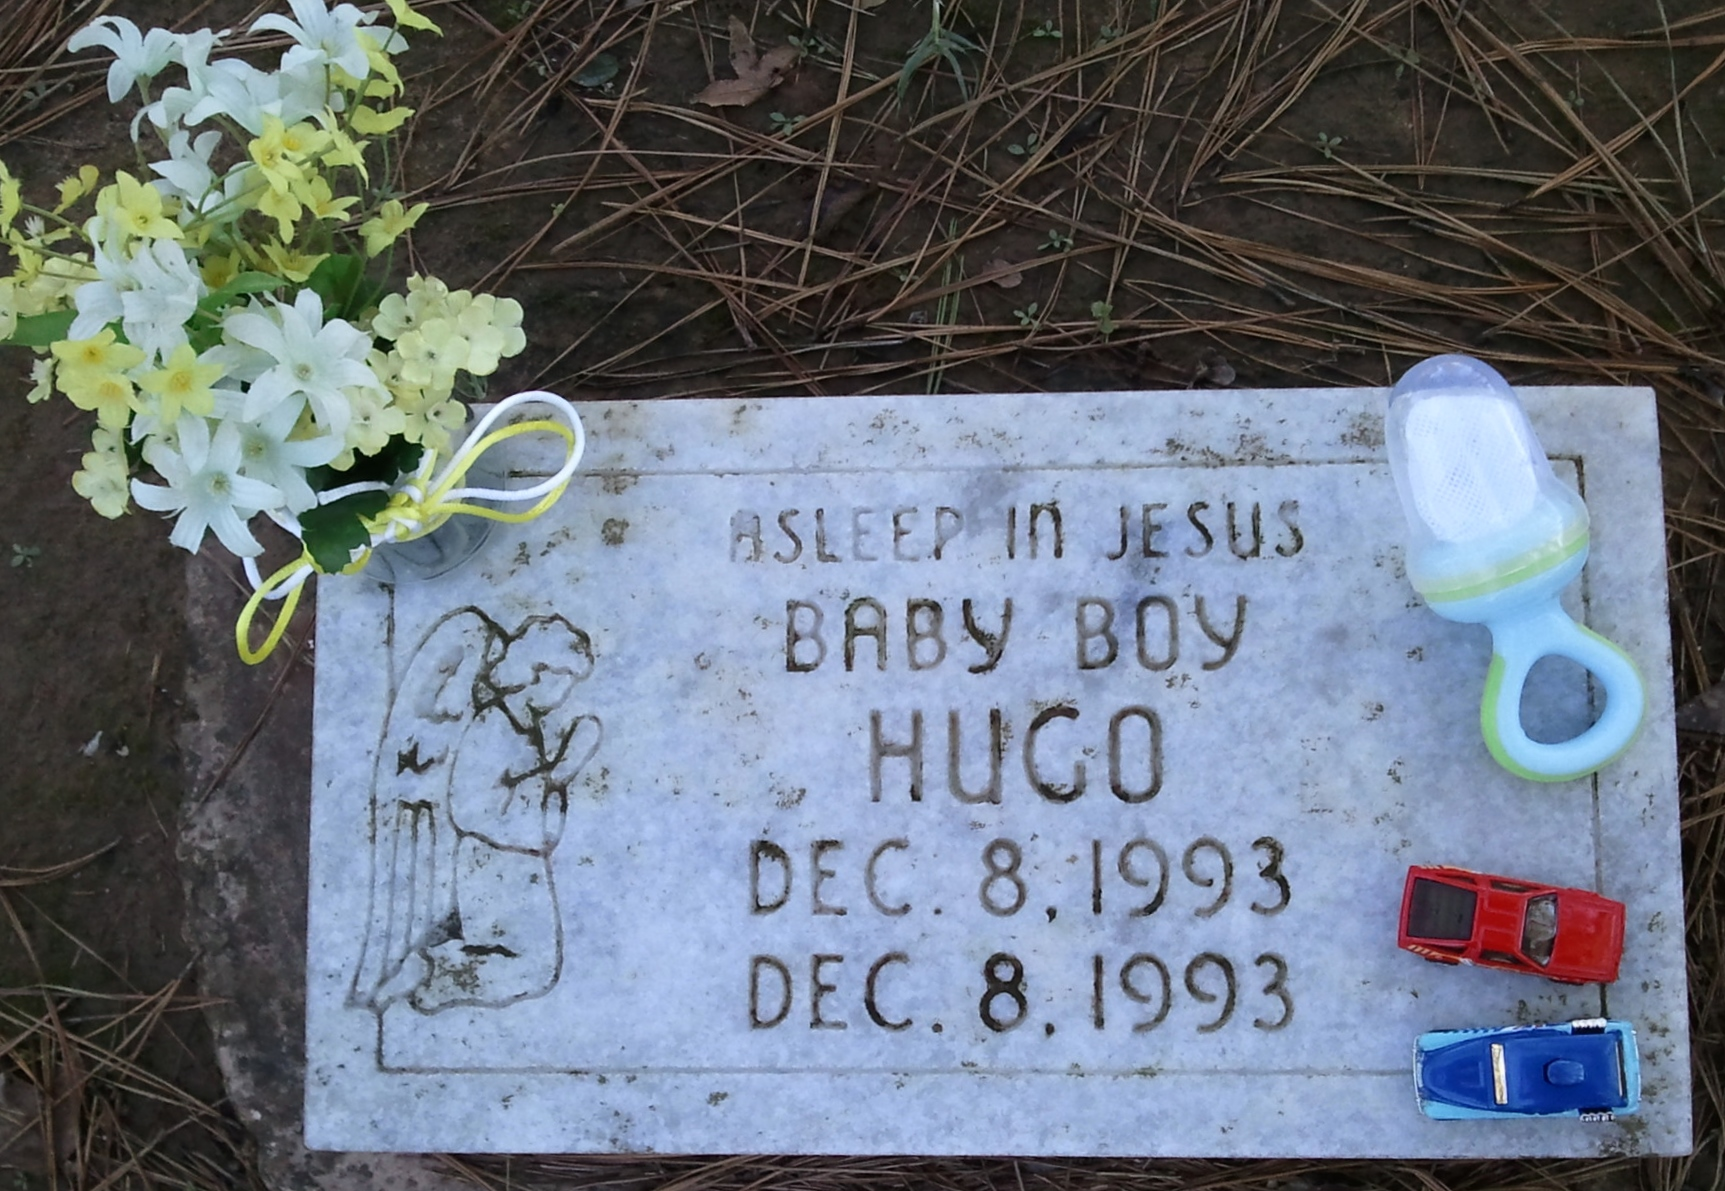 Baby Boy Hugo